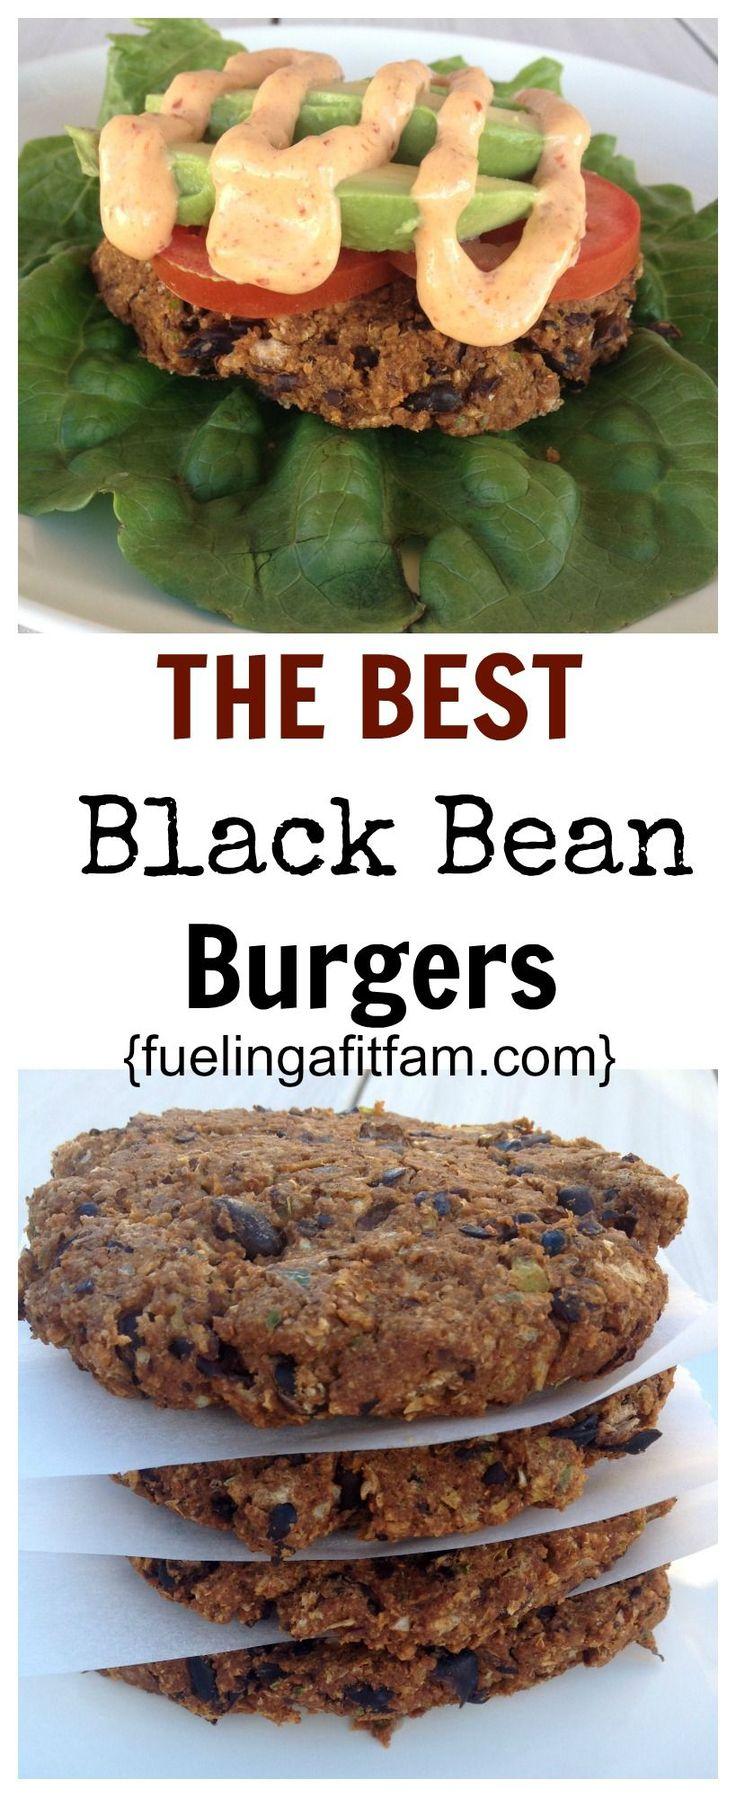 THE BEST Black Bean Burgers.